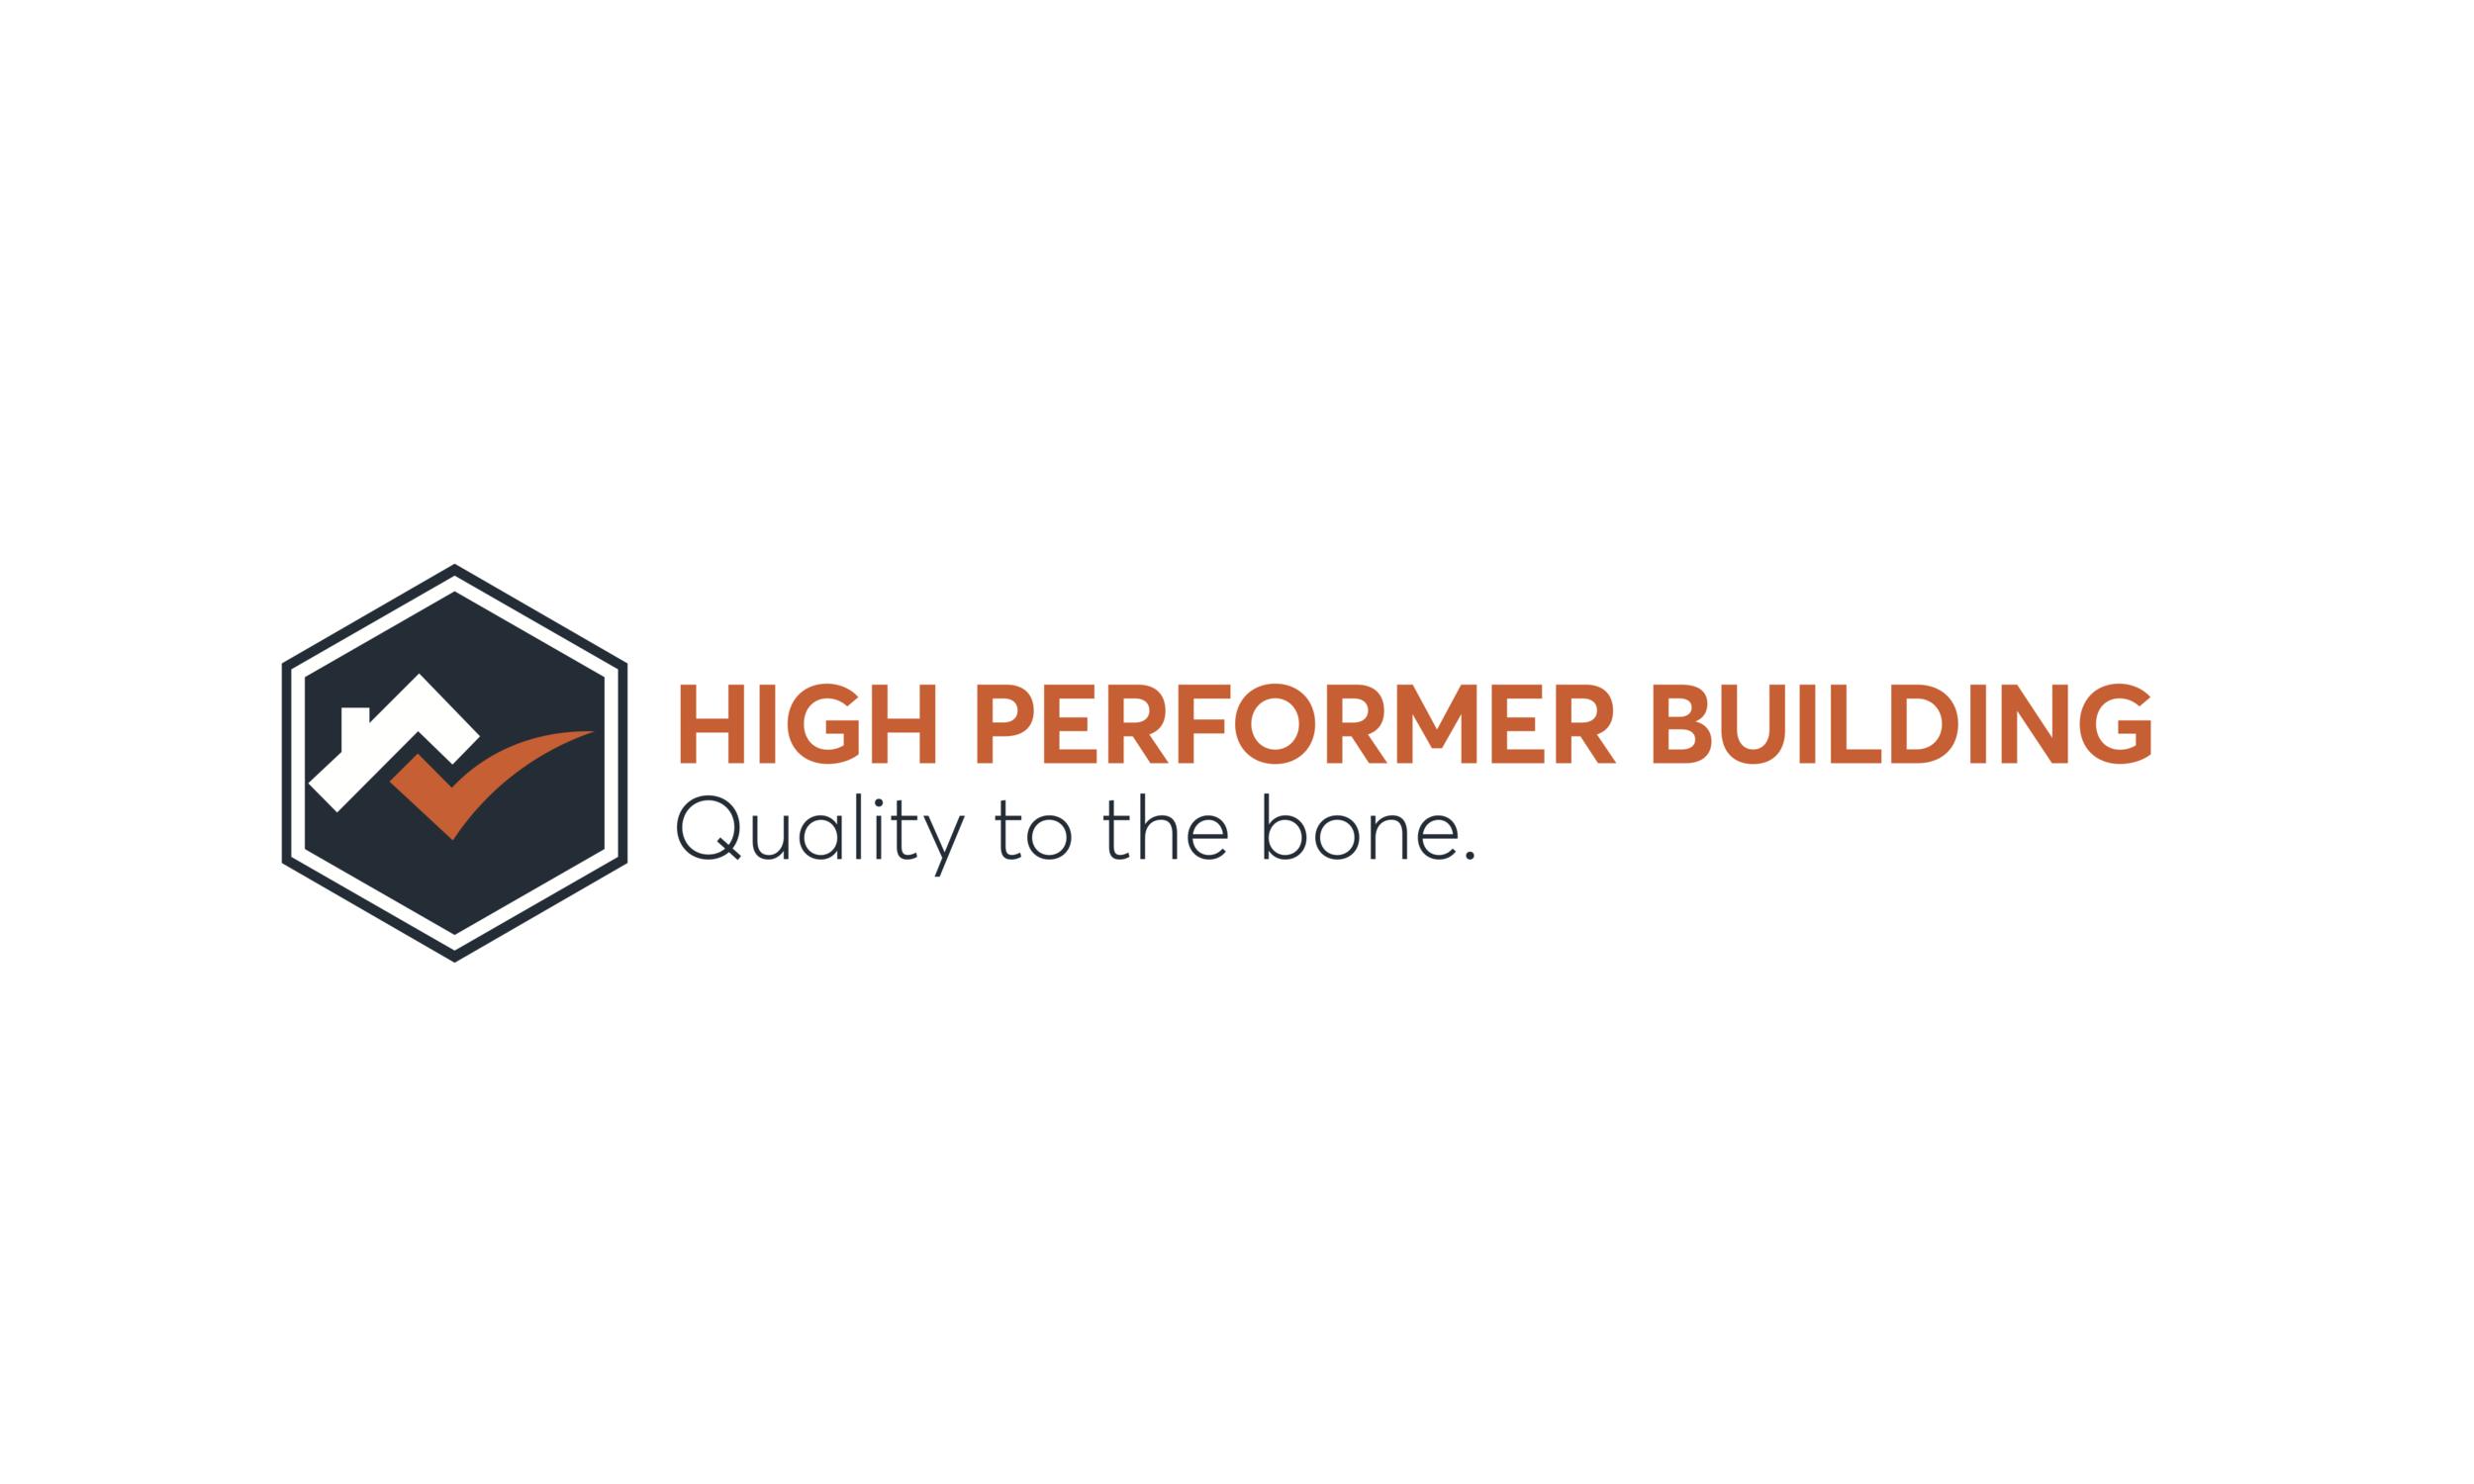 HPB-Logo-quality to the bone-Horizontal (Edited).png